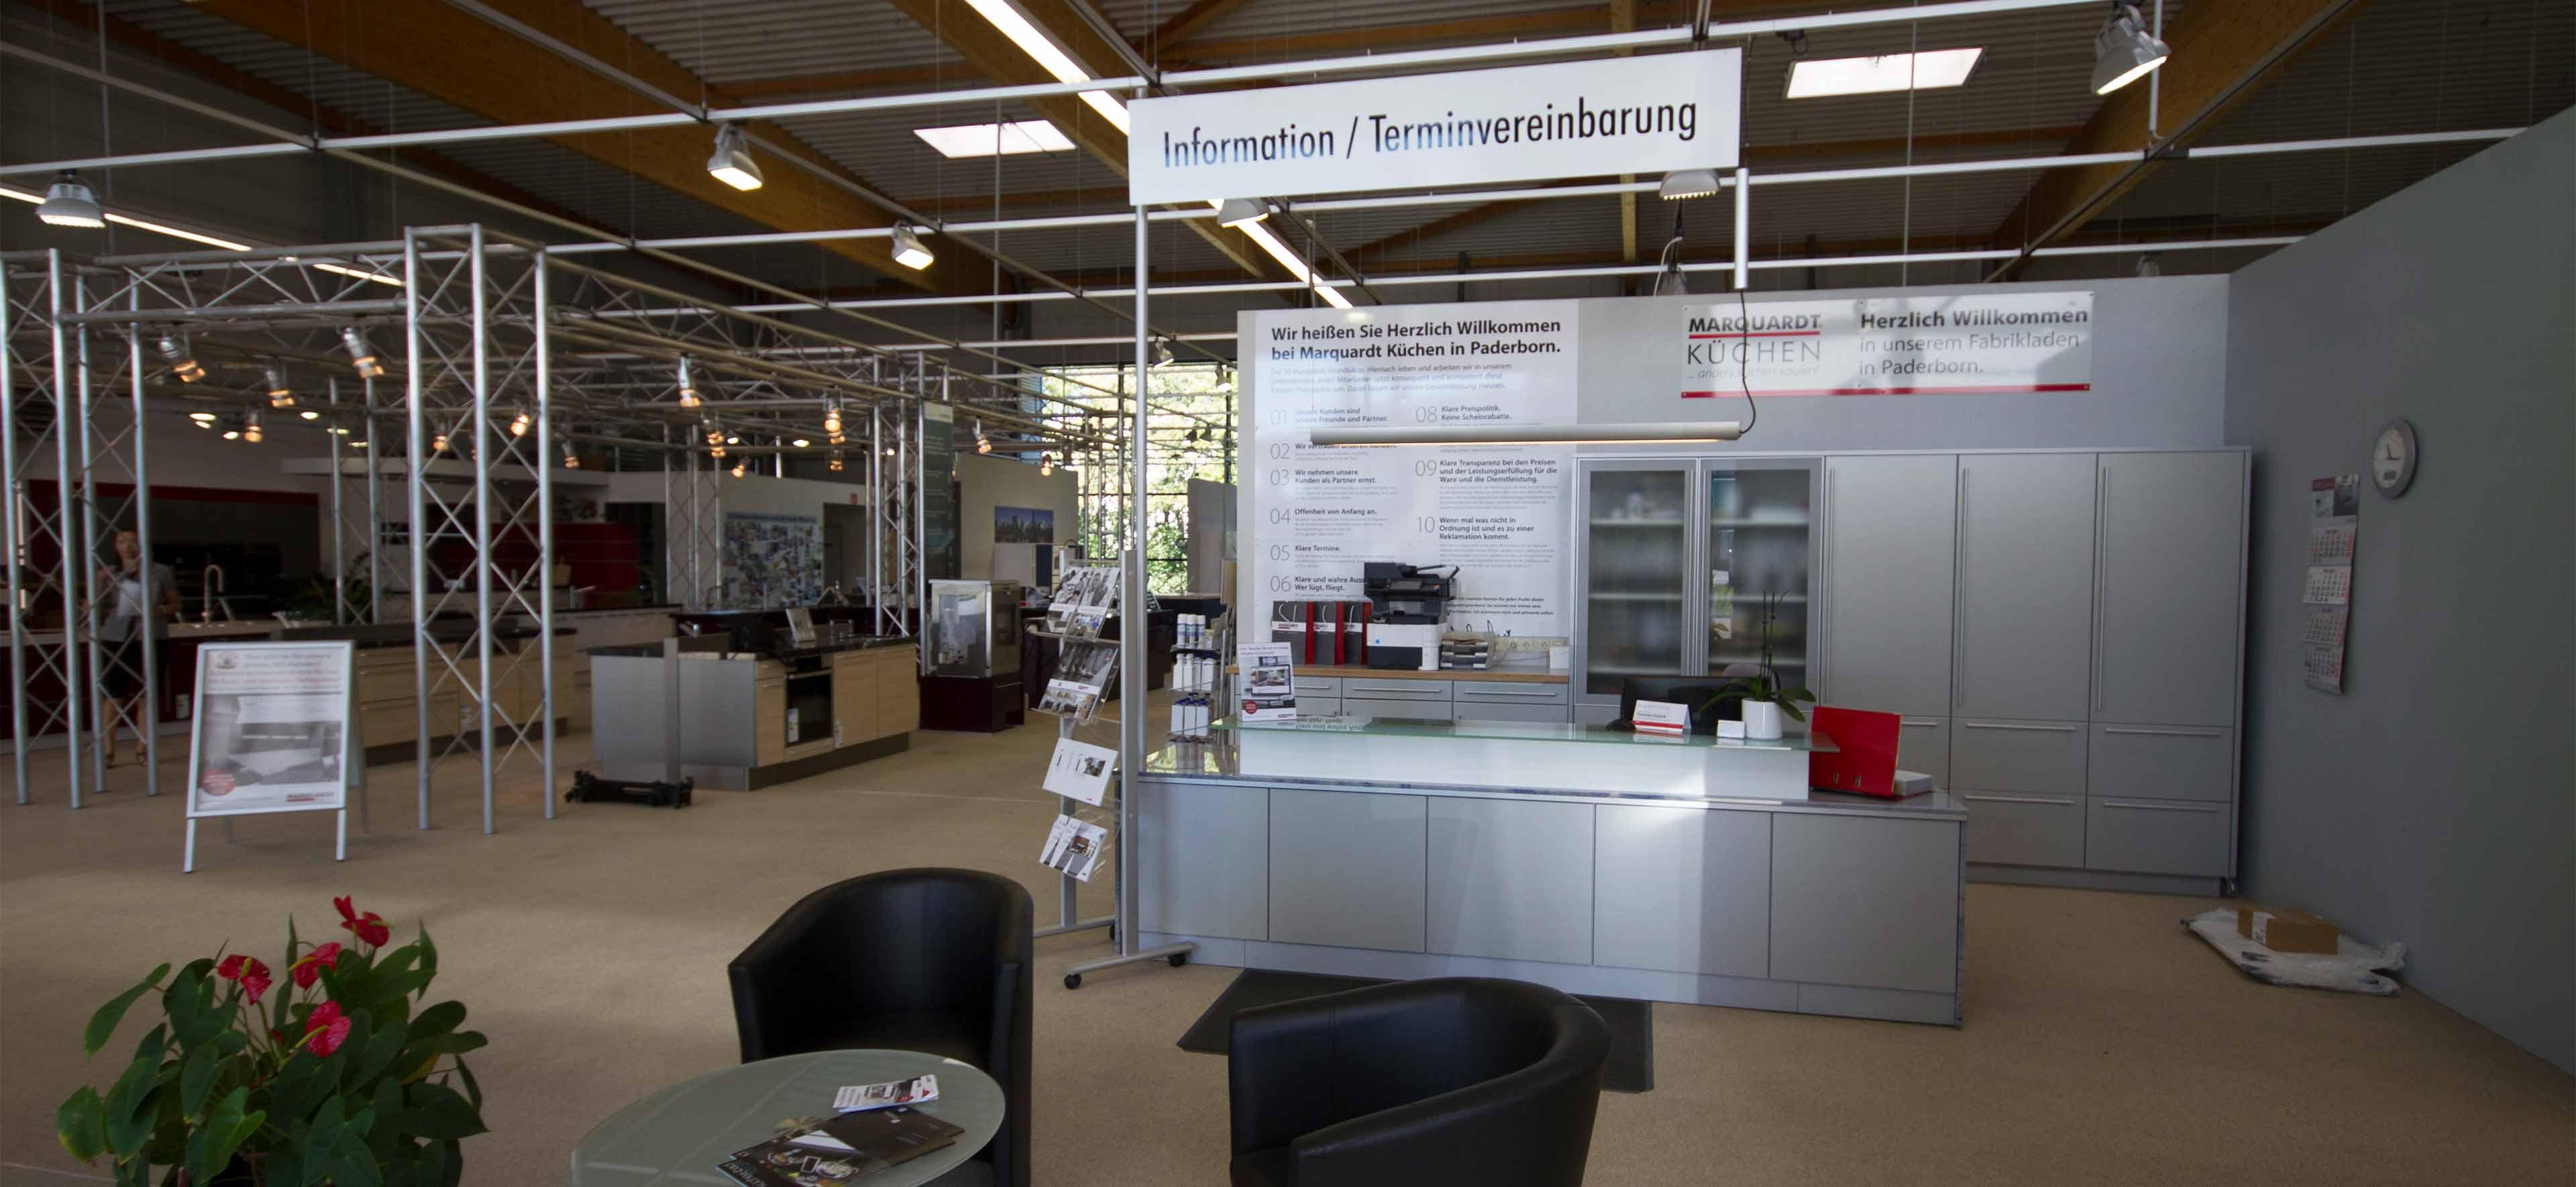 haus garten k chen in paderborn infobel deutschland. Black Bedroom Furniture Sets. Home Design Ideas